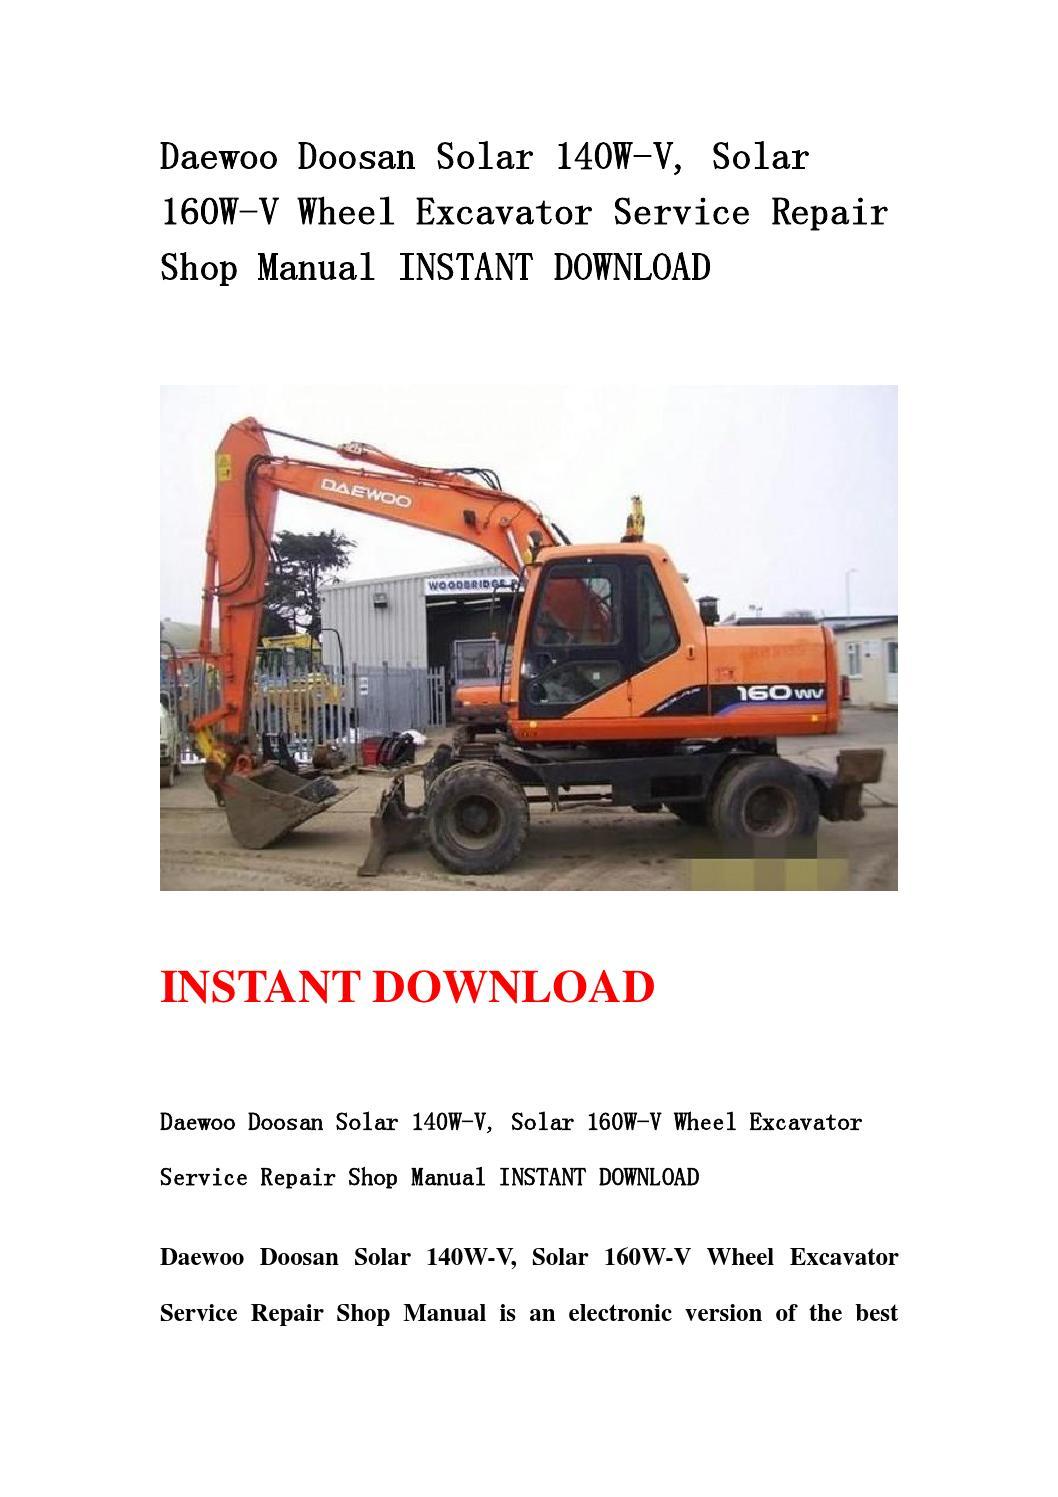 Daewoo doosan solar 140w v, solar 160w v wheel excavator service repair  shop manual instant download by ksejfnhse - issuu